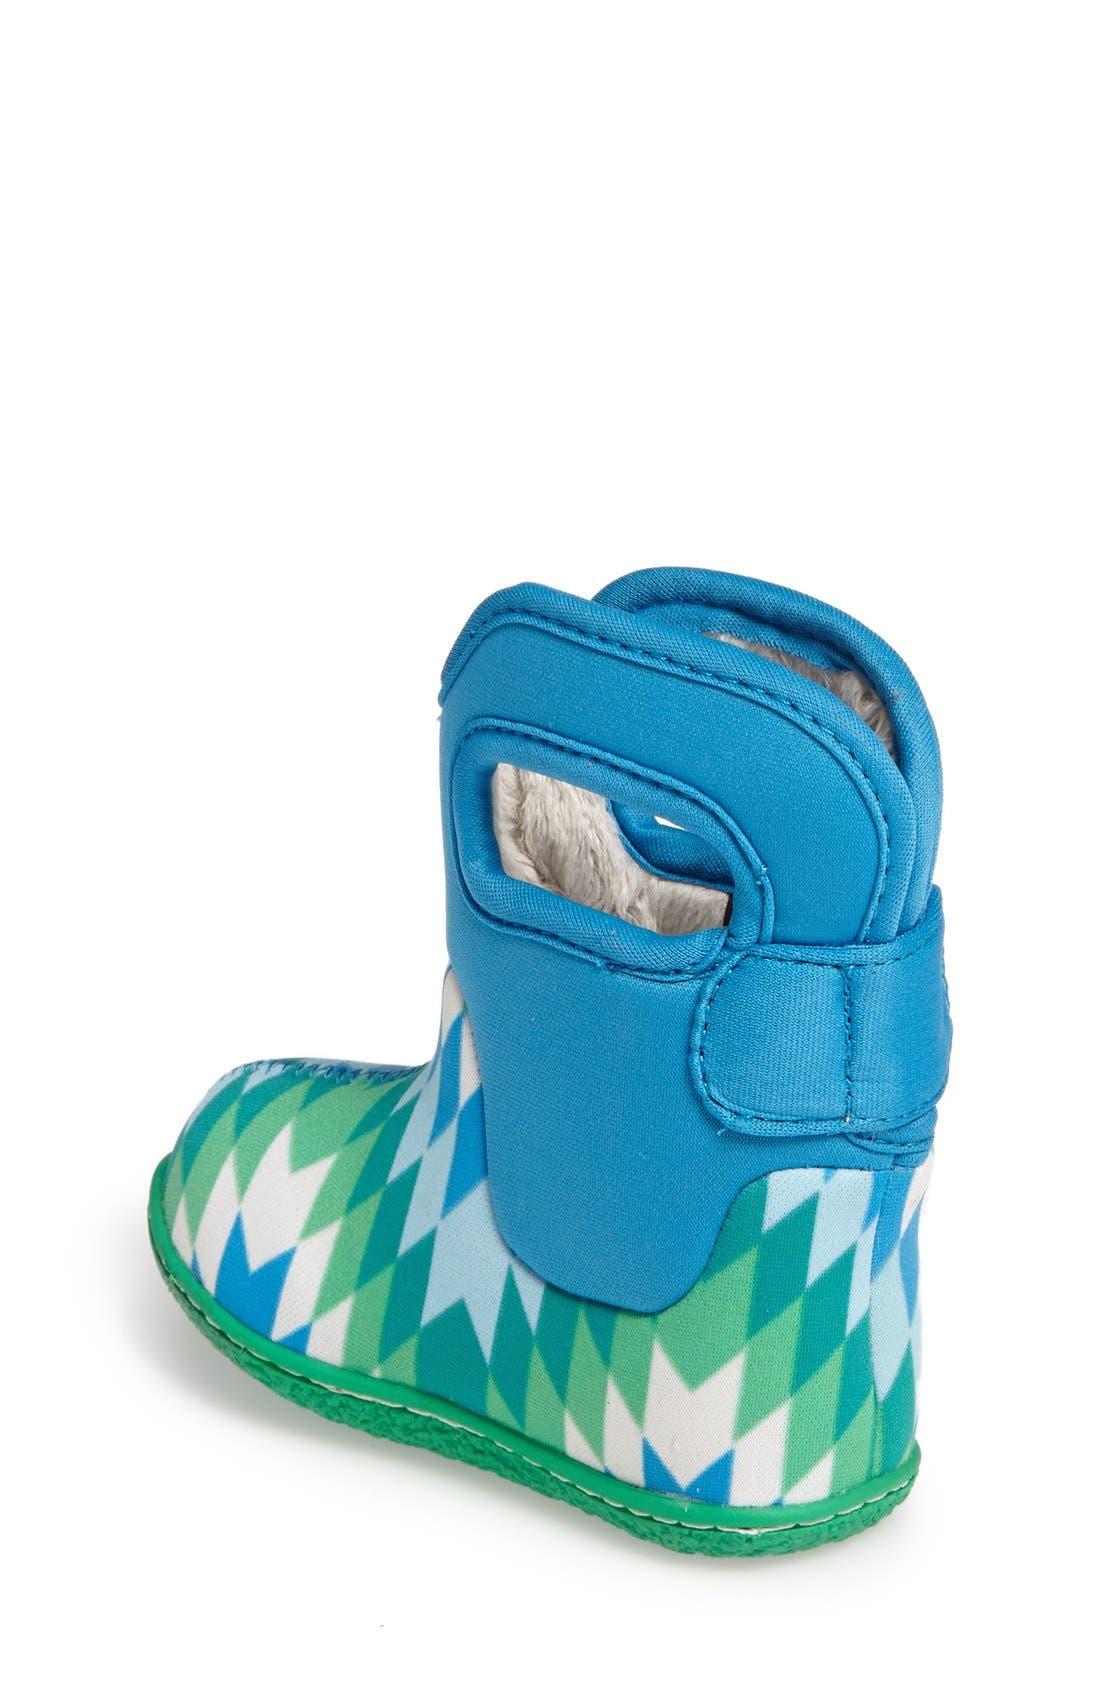 Alternate Image 2  - Bogs 'Classic' Waterproof Snow Boot (Baby, Walker & Toddler)